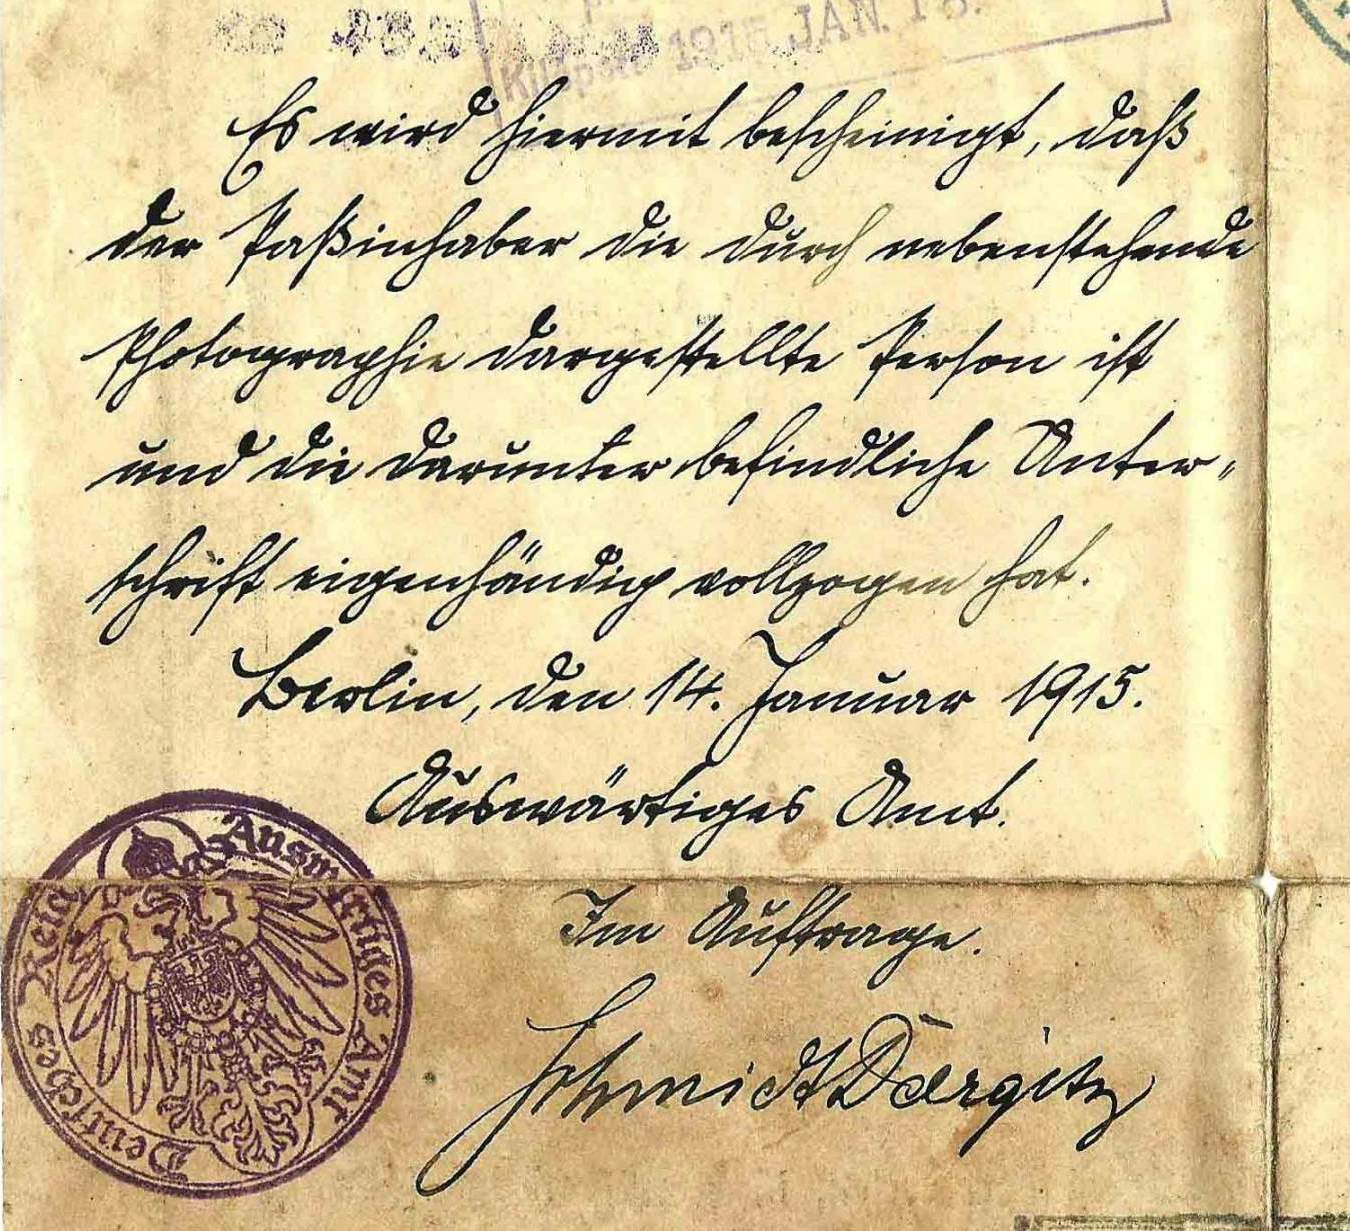 Confirmation of identity of passport holder (1915)